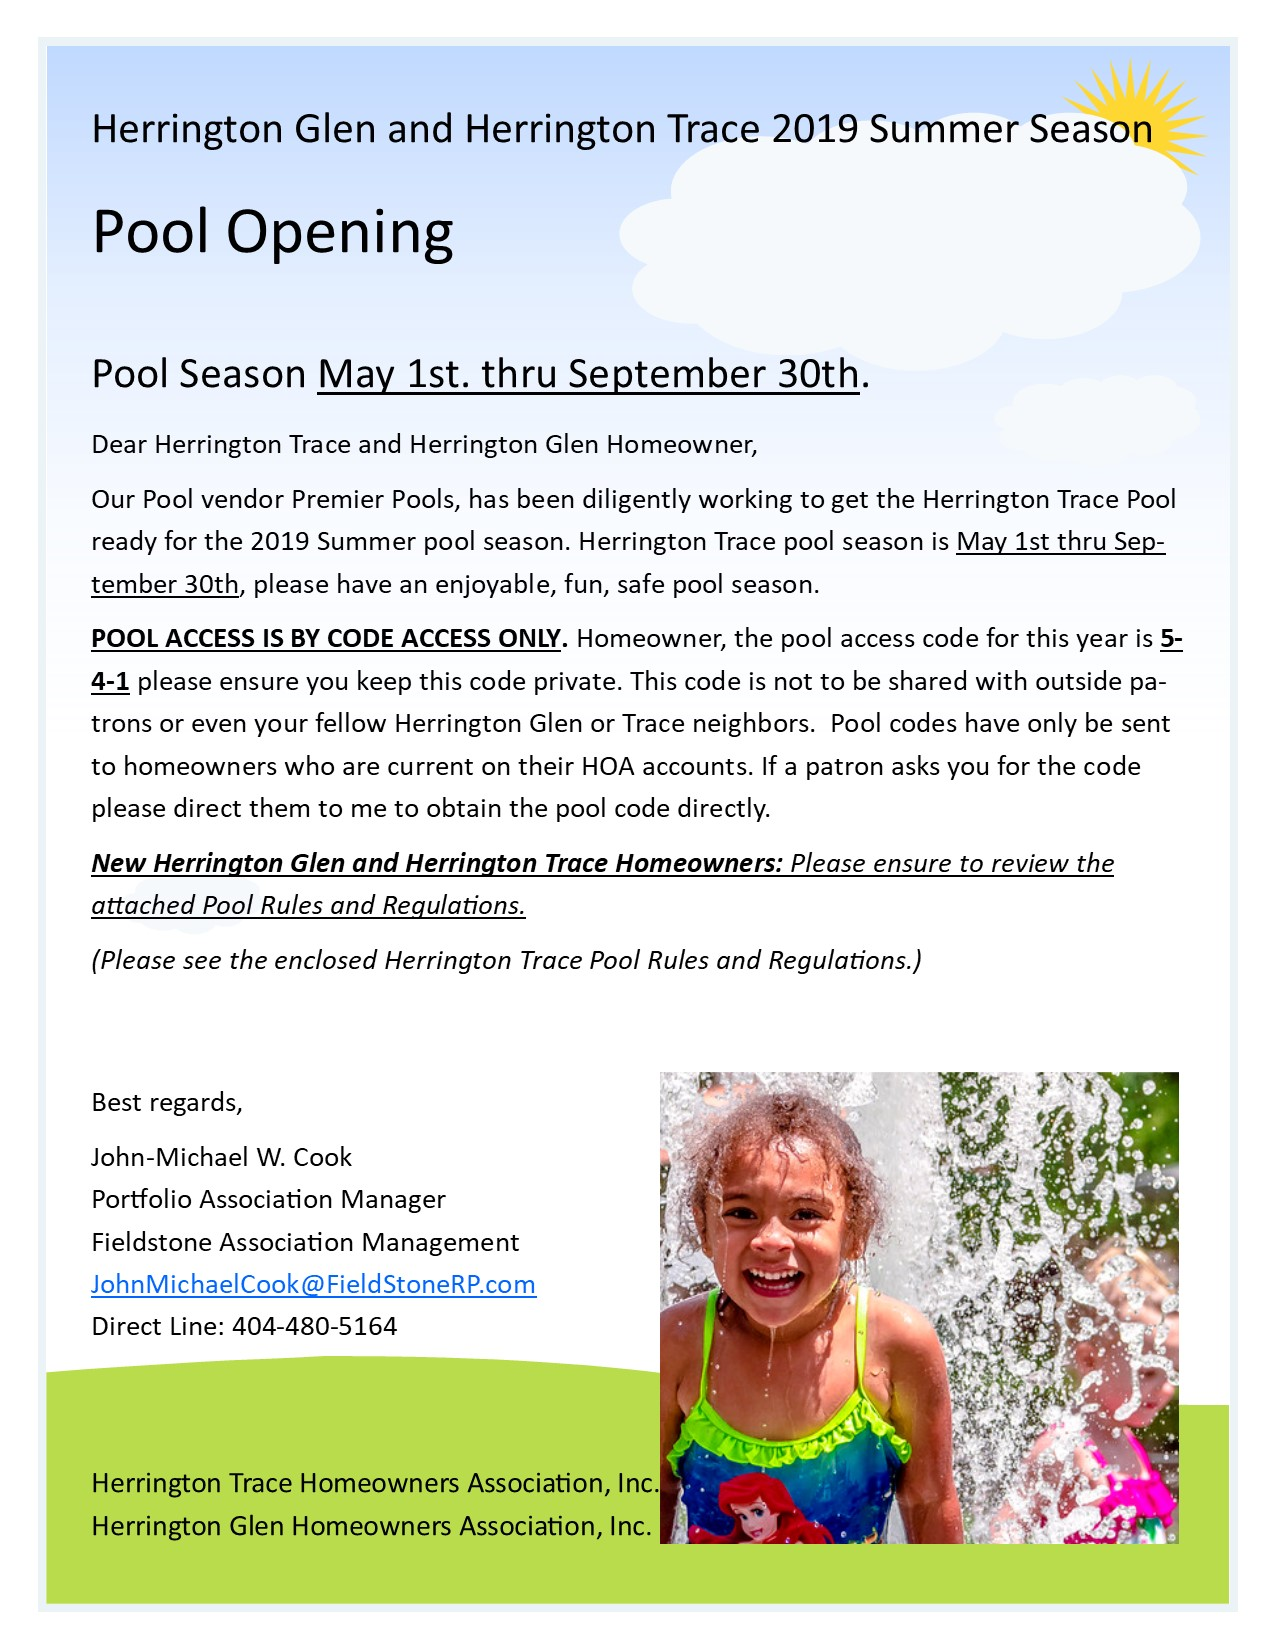 HerringtonTrace_2019SummerSeason_Pool